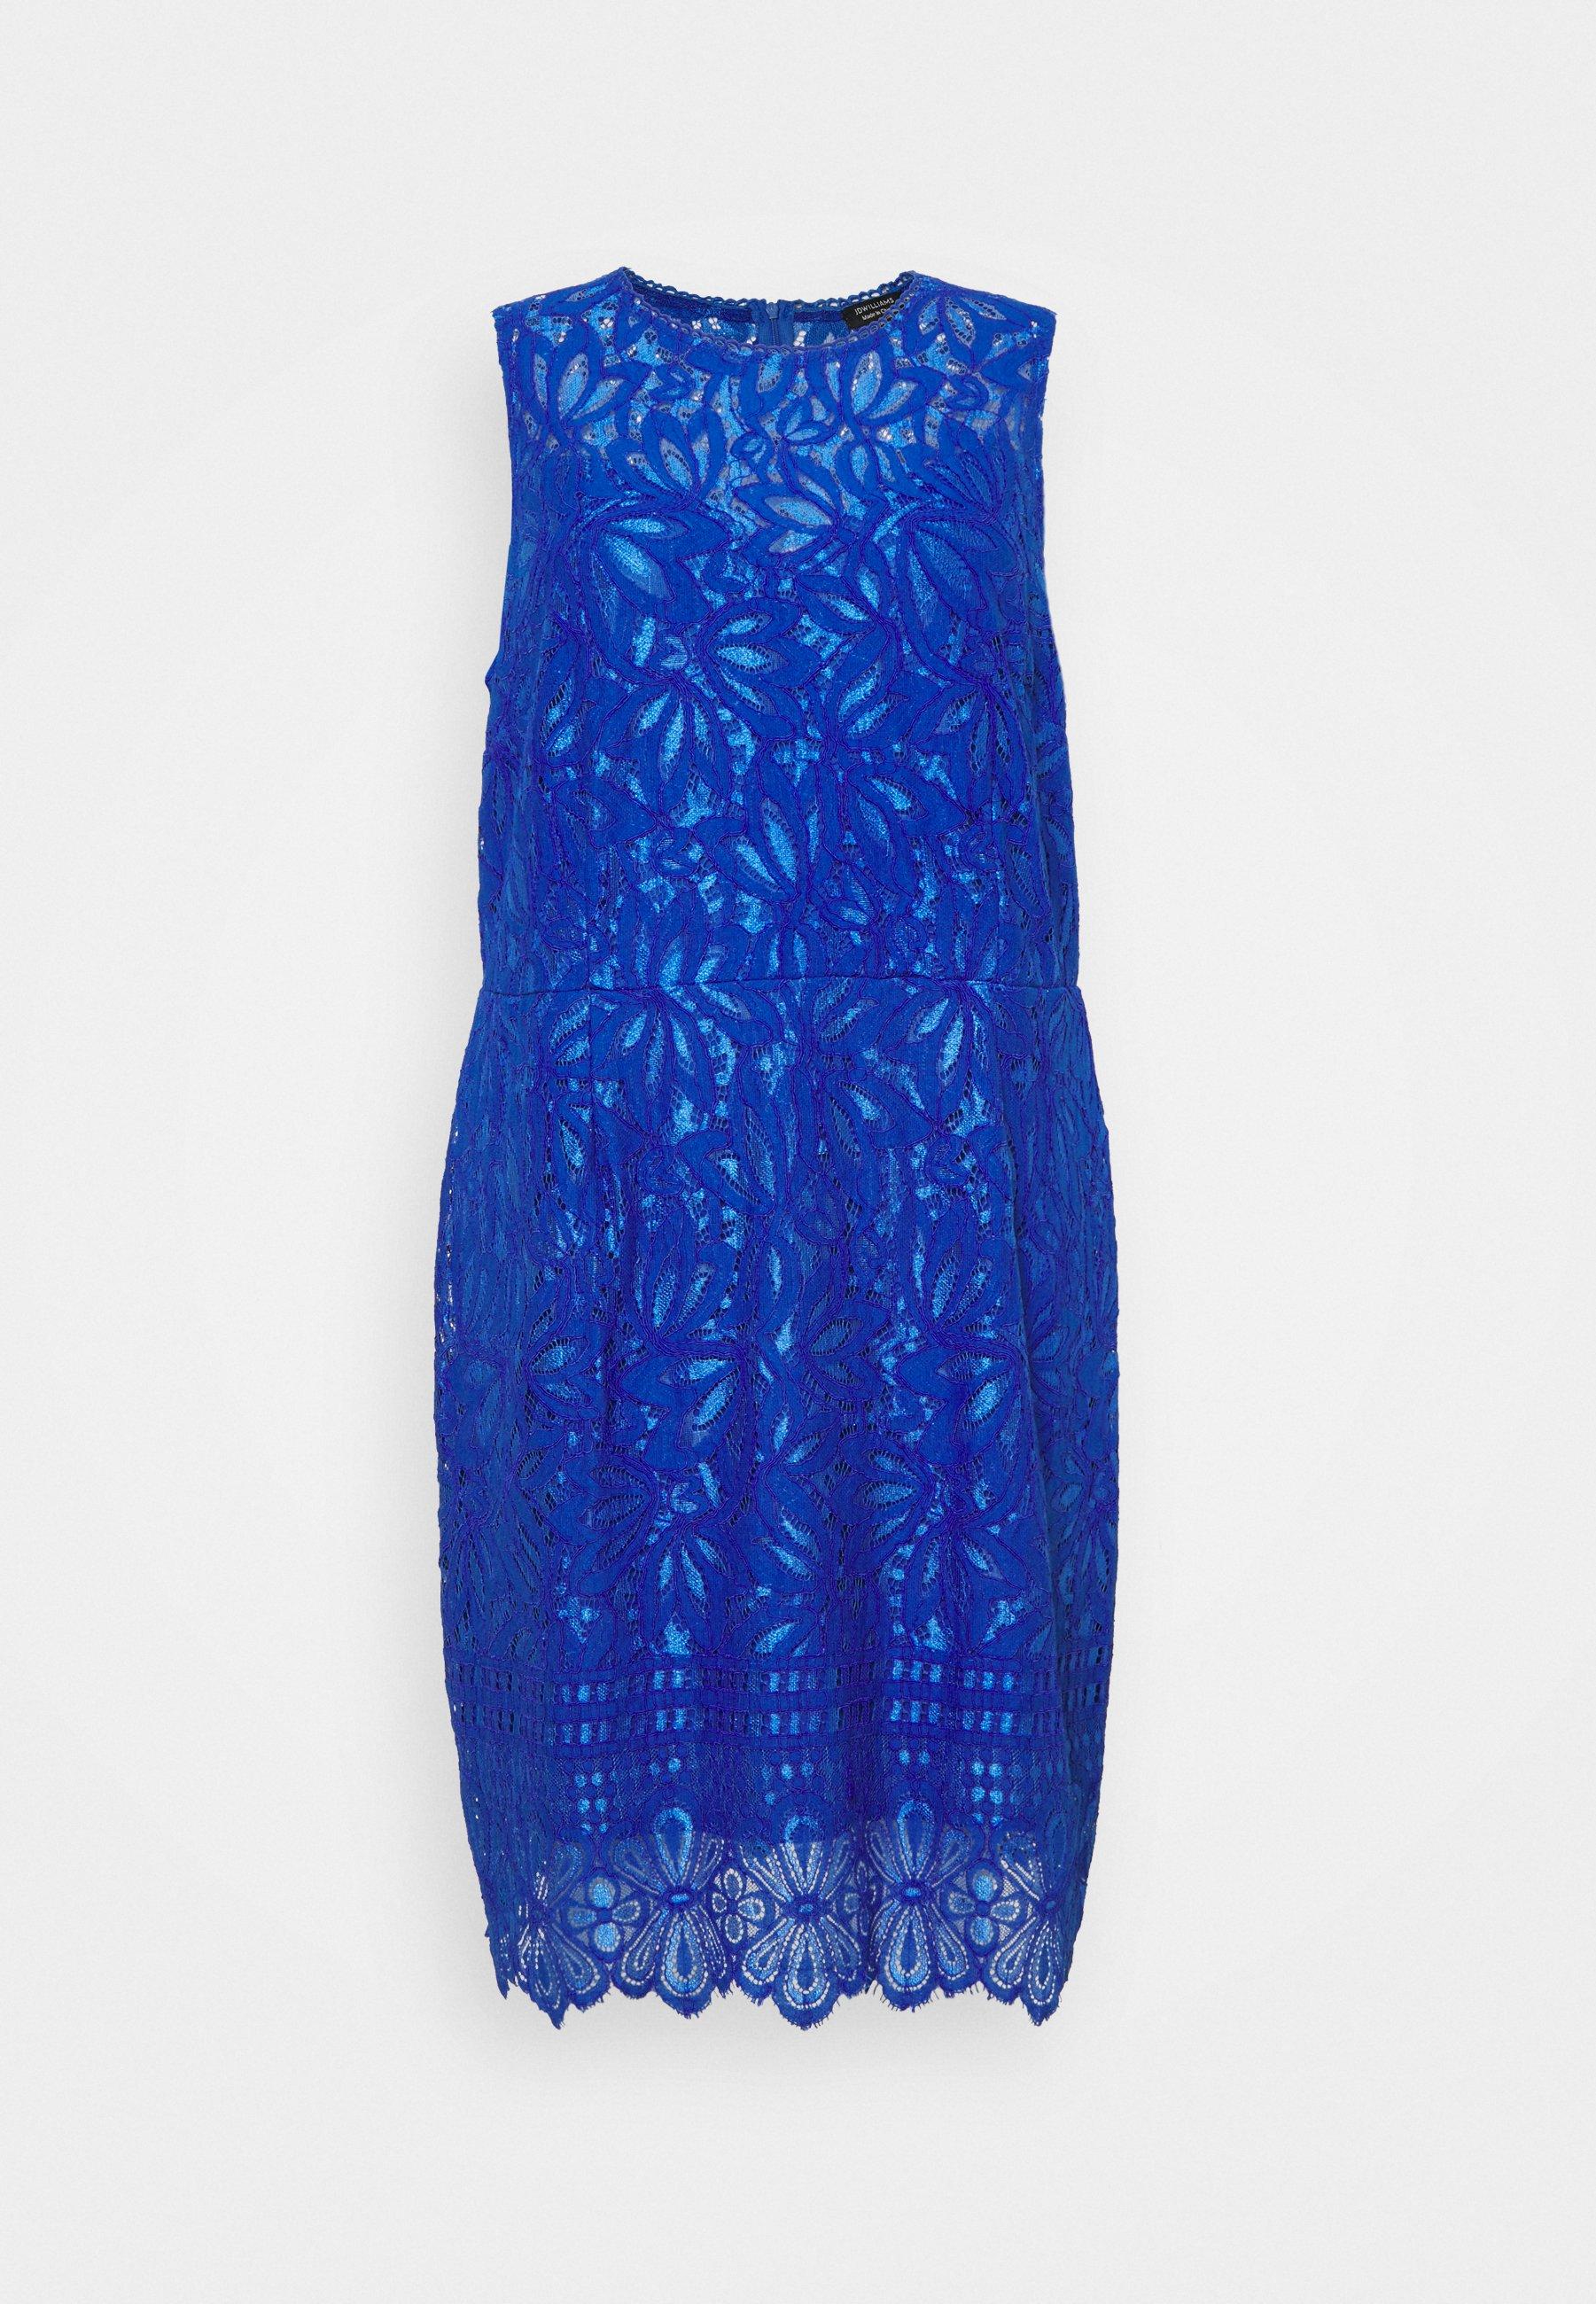 Capsule By Simply Be Dress Cocktailkleid Festliches Kleid Cobalt Blau Zalando De